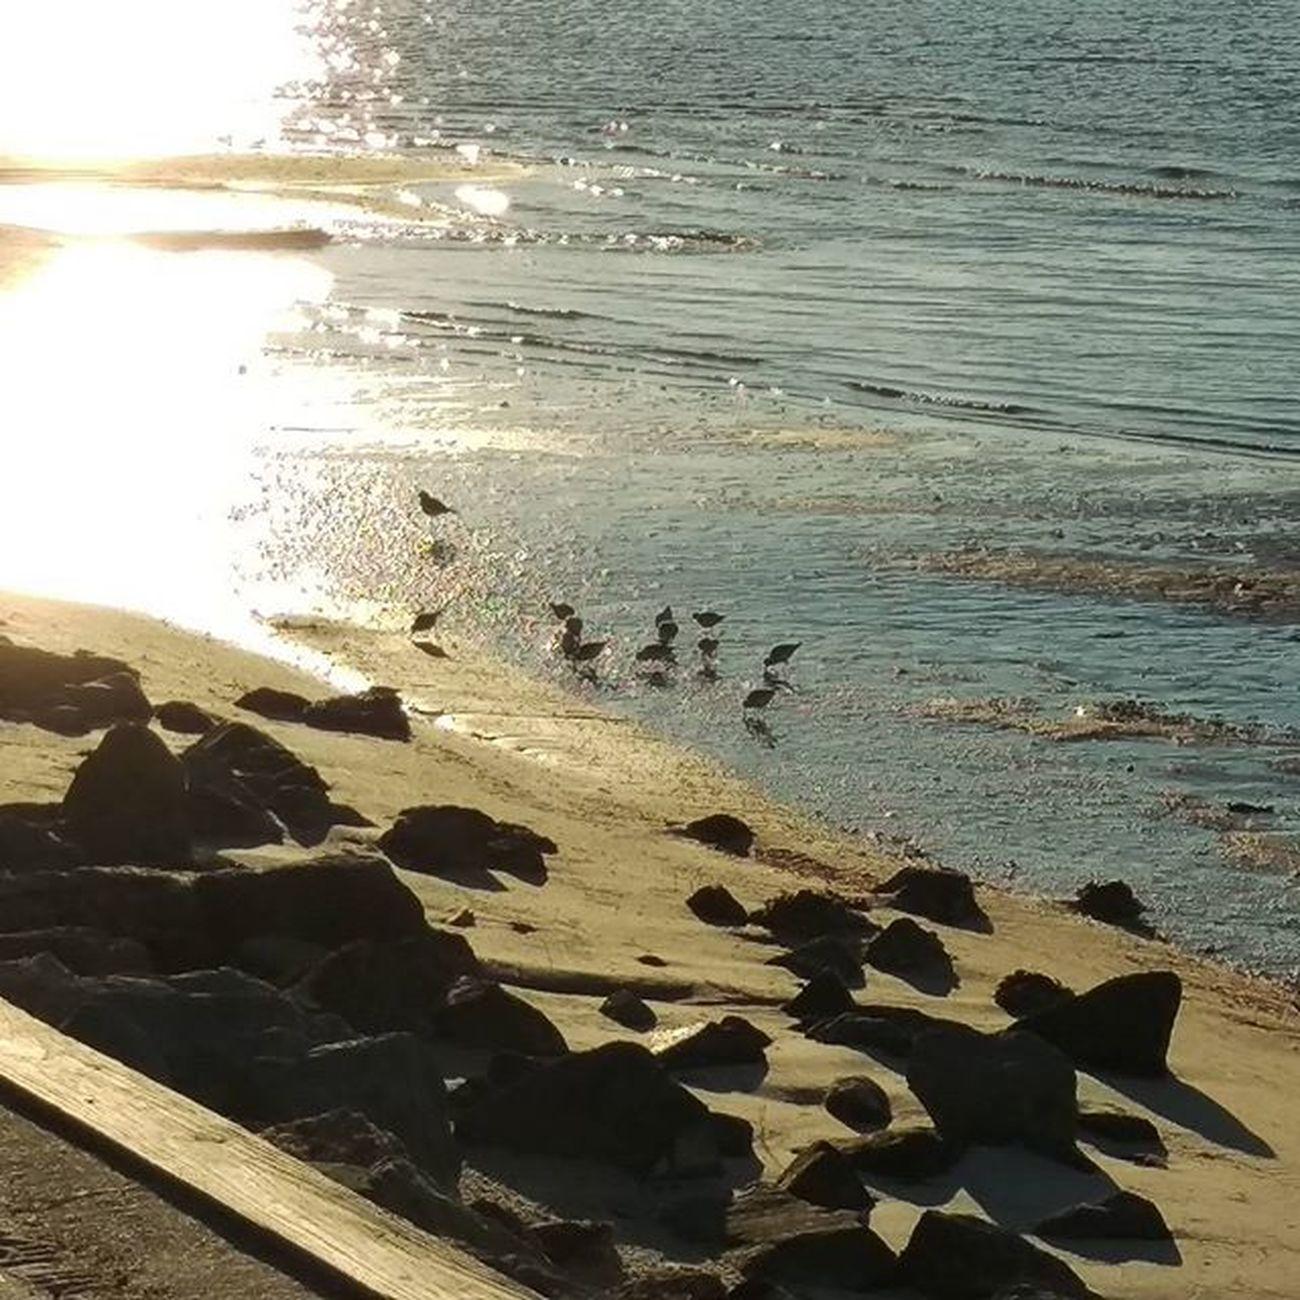 Birdsonthewater Sunreflection LoveFl Emeraldcoast Emeraldcoasting HTCOneM9 Htconelife Oneography 20 .7mp @htc @HTCUSA @HTC_UK @HTCelevate @HTCMEA @HTC_IN @HTCIreland @HTCCanada @HTCMalaysia @htcsouthasia @htcfrance TeamHTC @sharealittlesunshine @pureflorida Beachlife